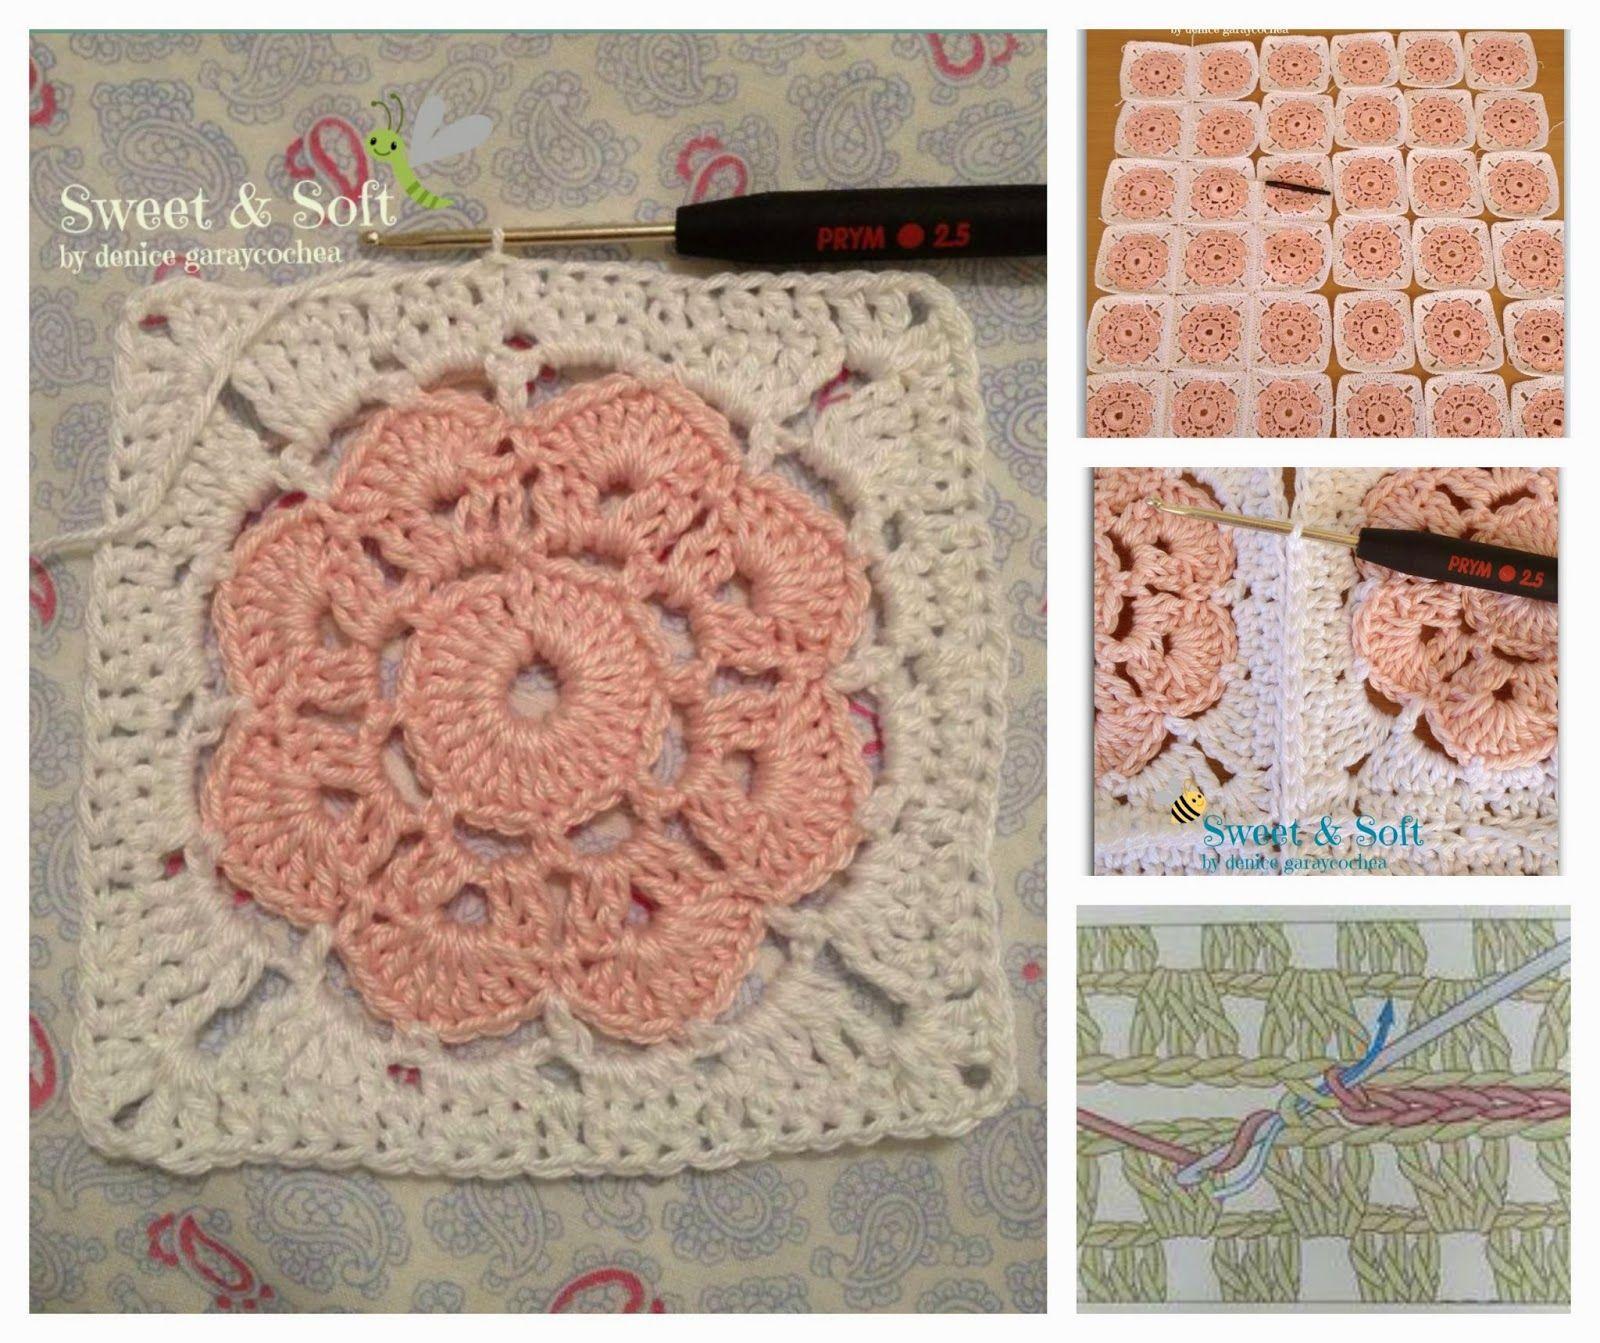 Cmo hacer un granny square con flor maybelle a crochet maybelle square para hacer la flor necesitan lana o hilo de algodn del grosor para trabajarla quilting patternscrochet motifcrochet bankloansurffo Images